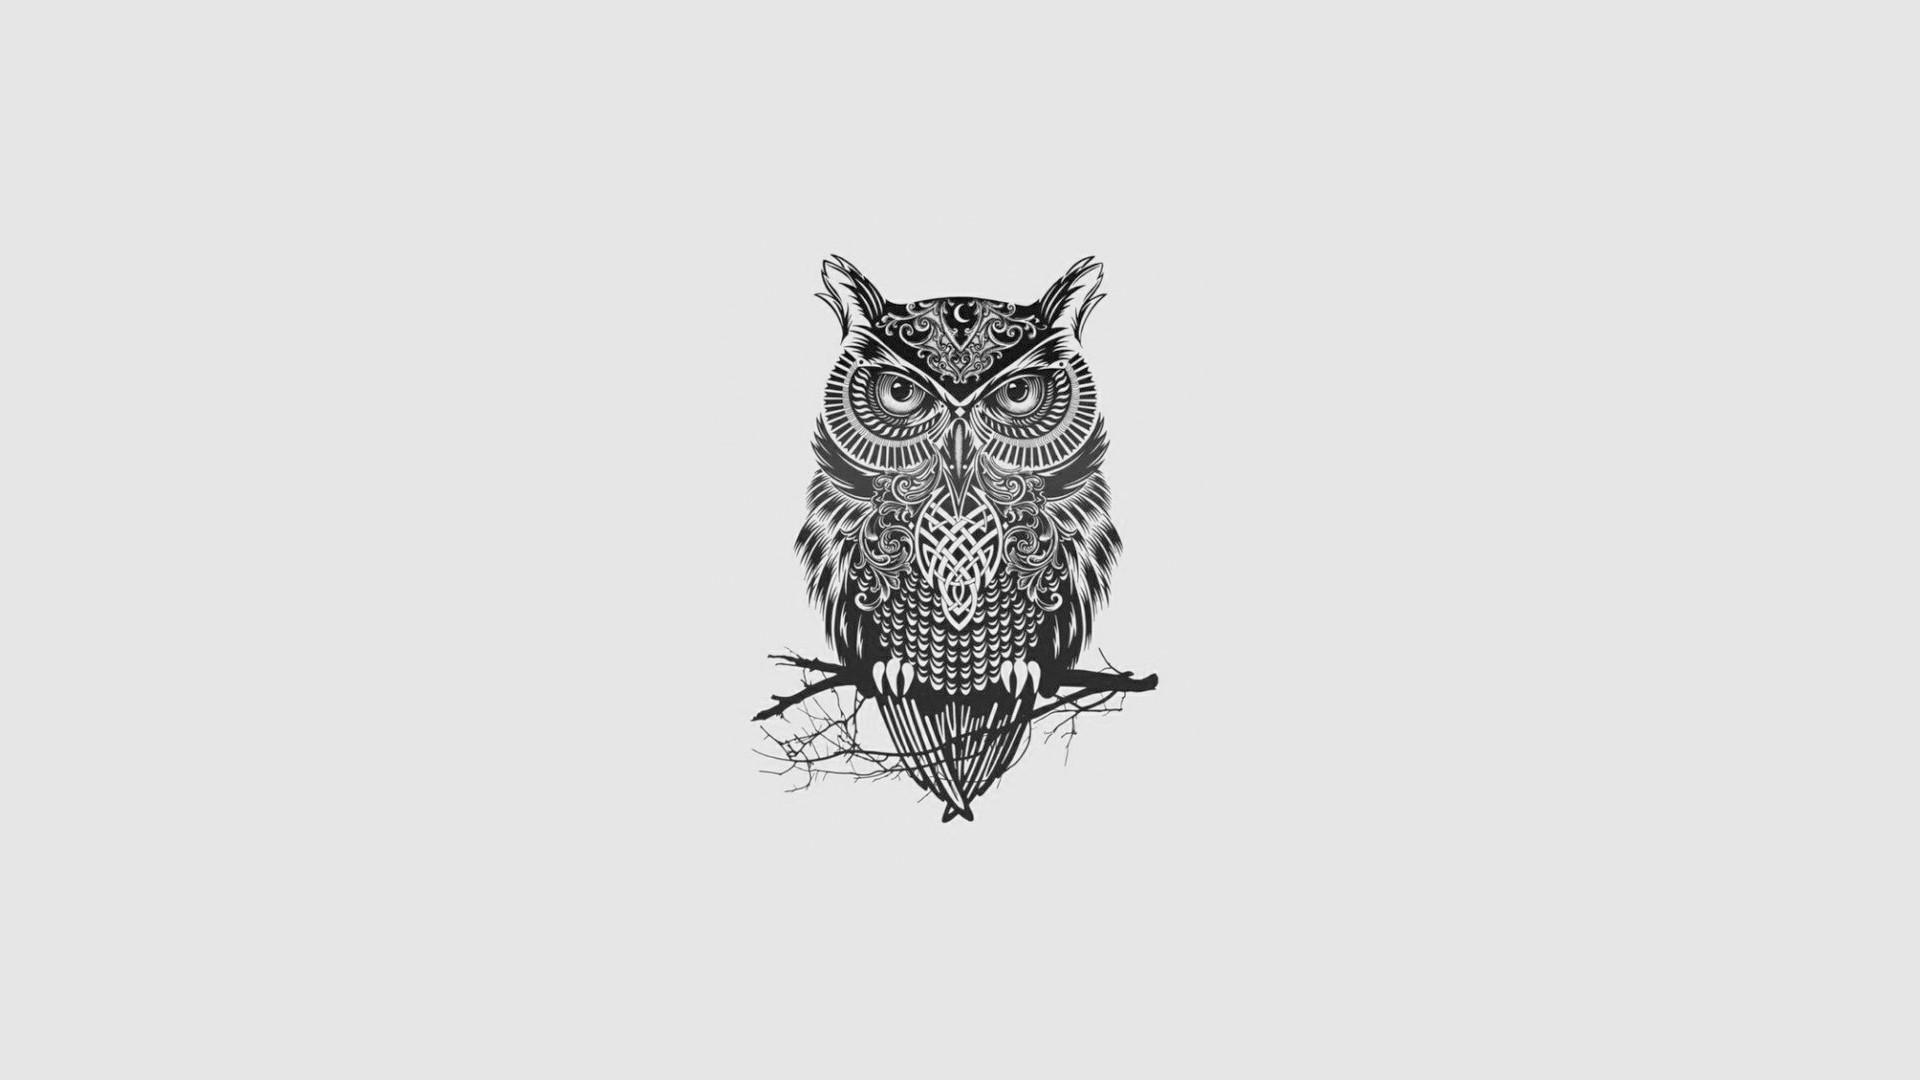 Fond D Ecran Dessin Illustration Monochrome Minimalisme